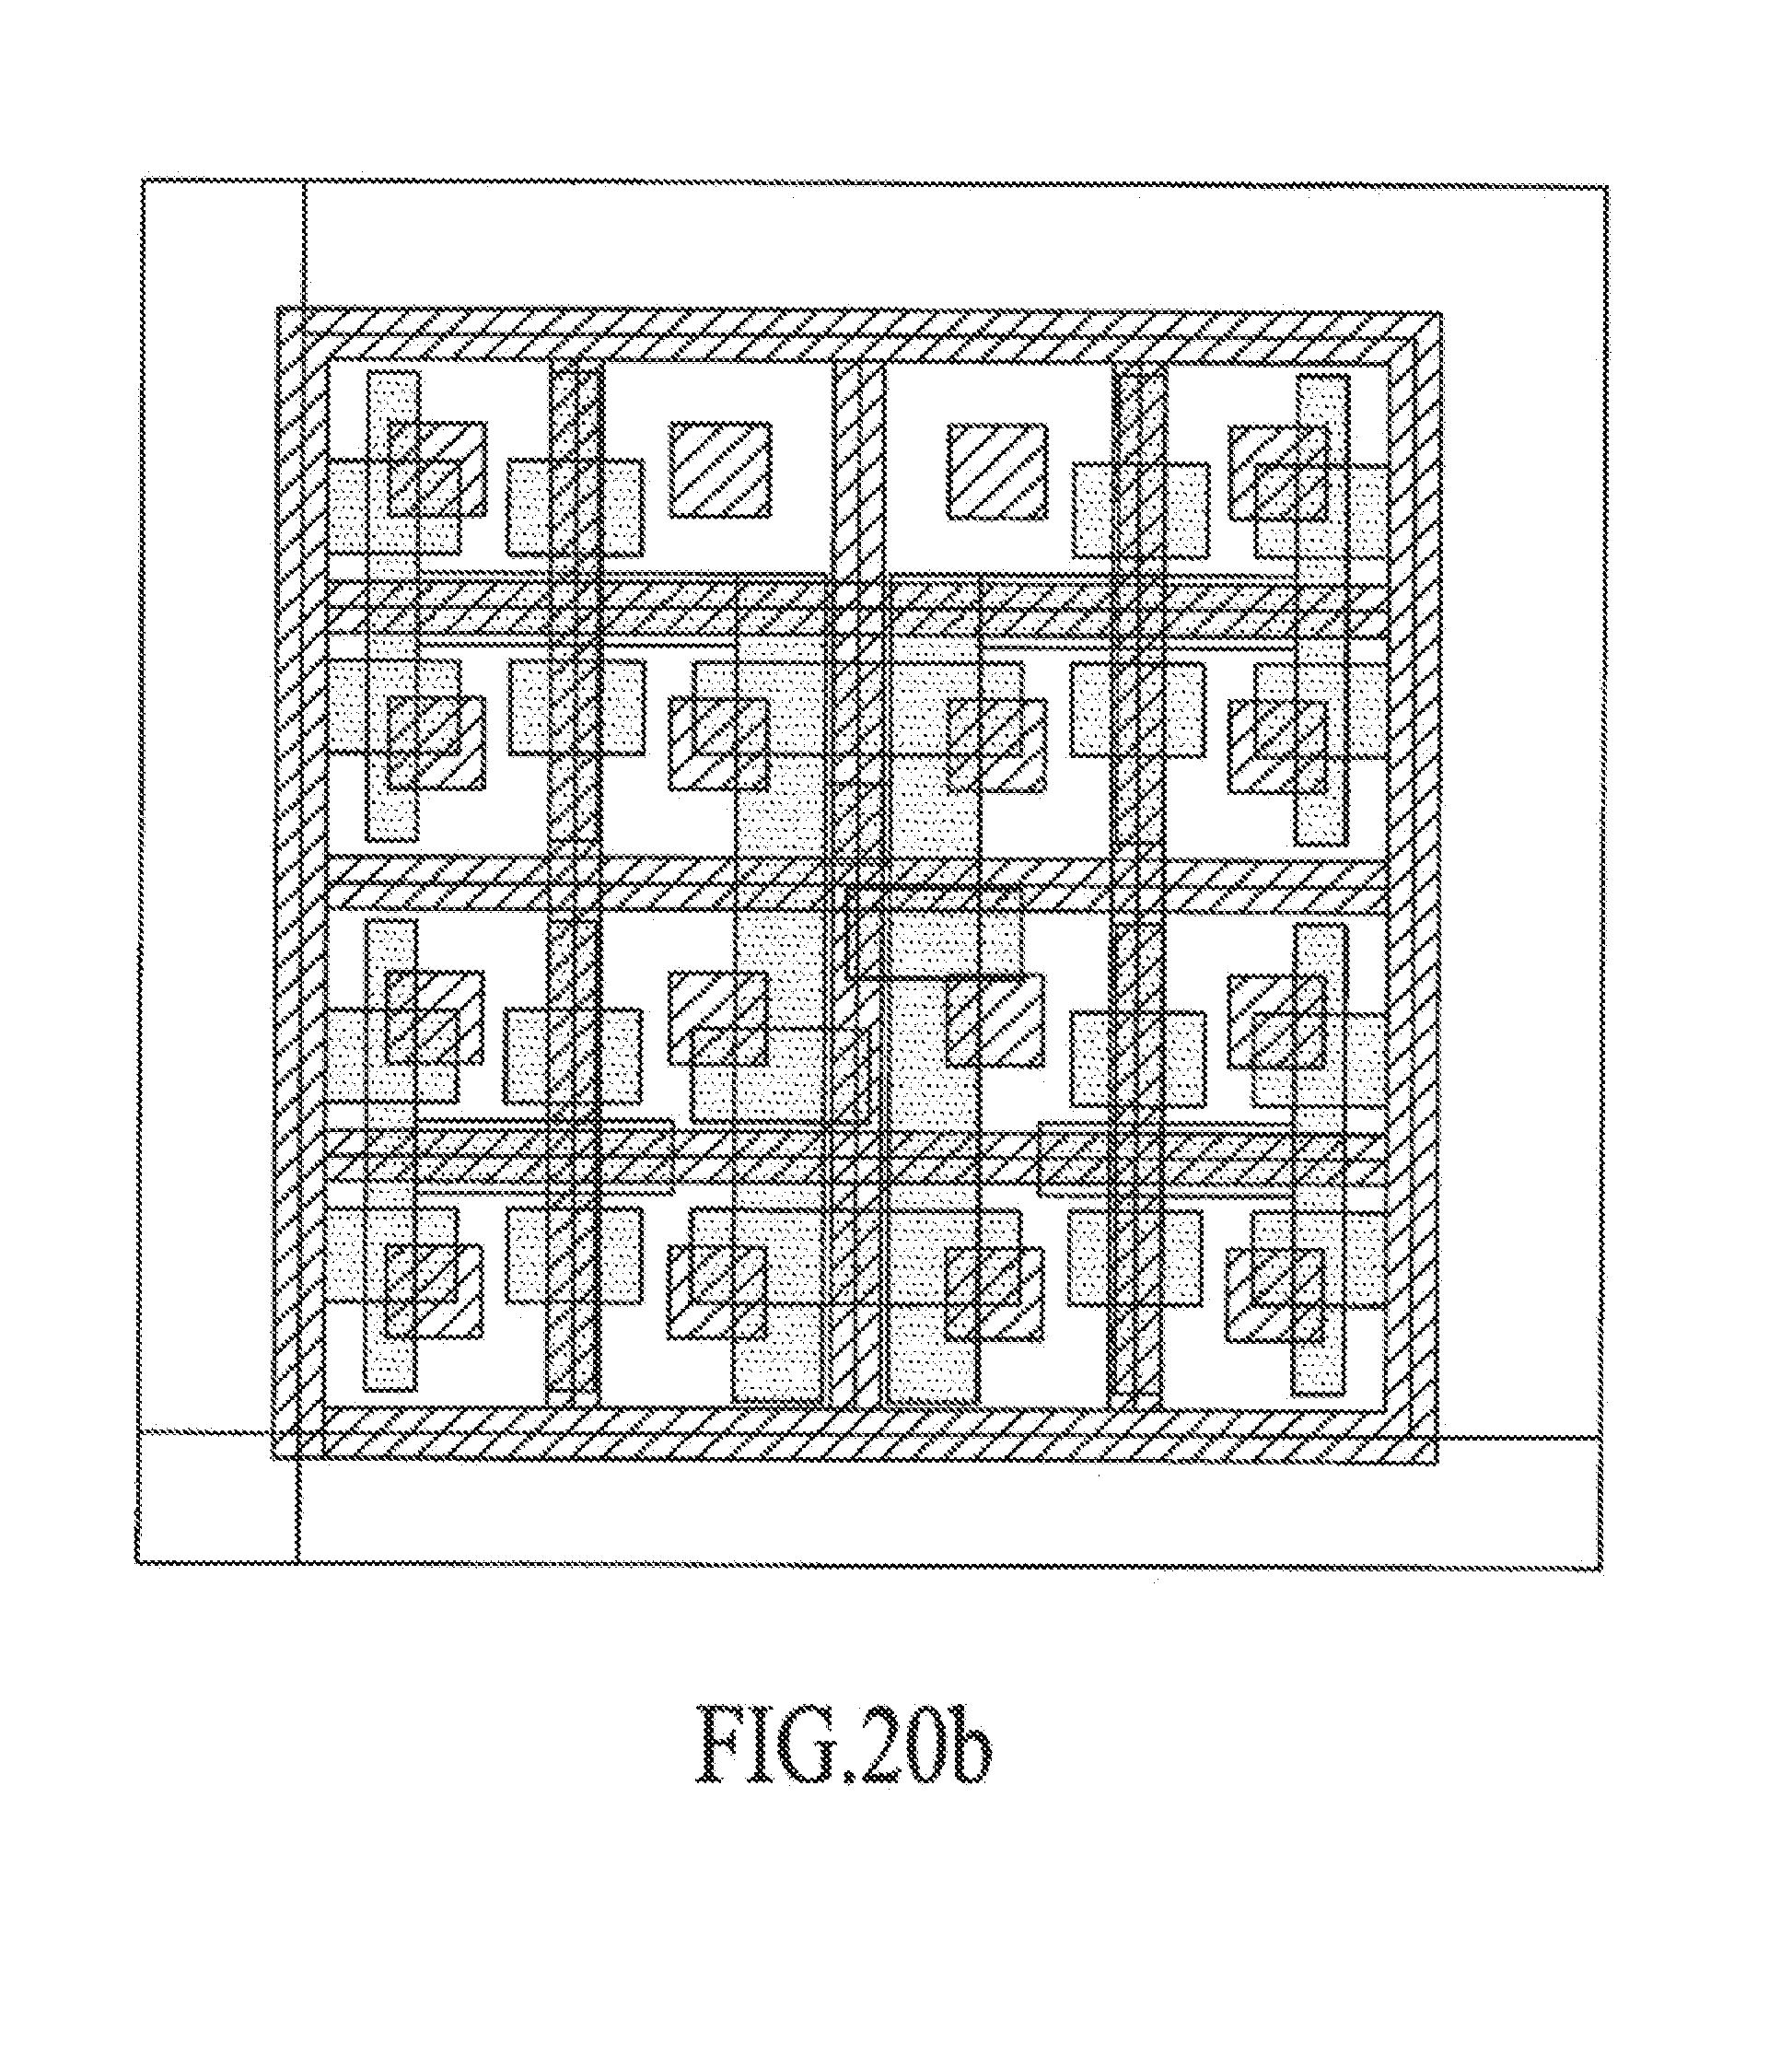 Patent Us 8530940 B2 600 X 540 45 Kb Jpeg Simple Flashing Led Circuit Images